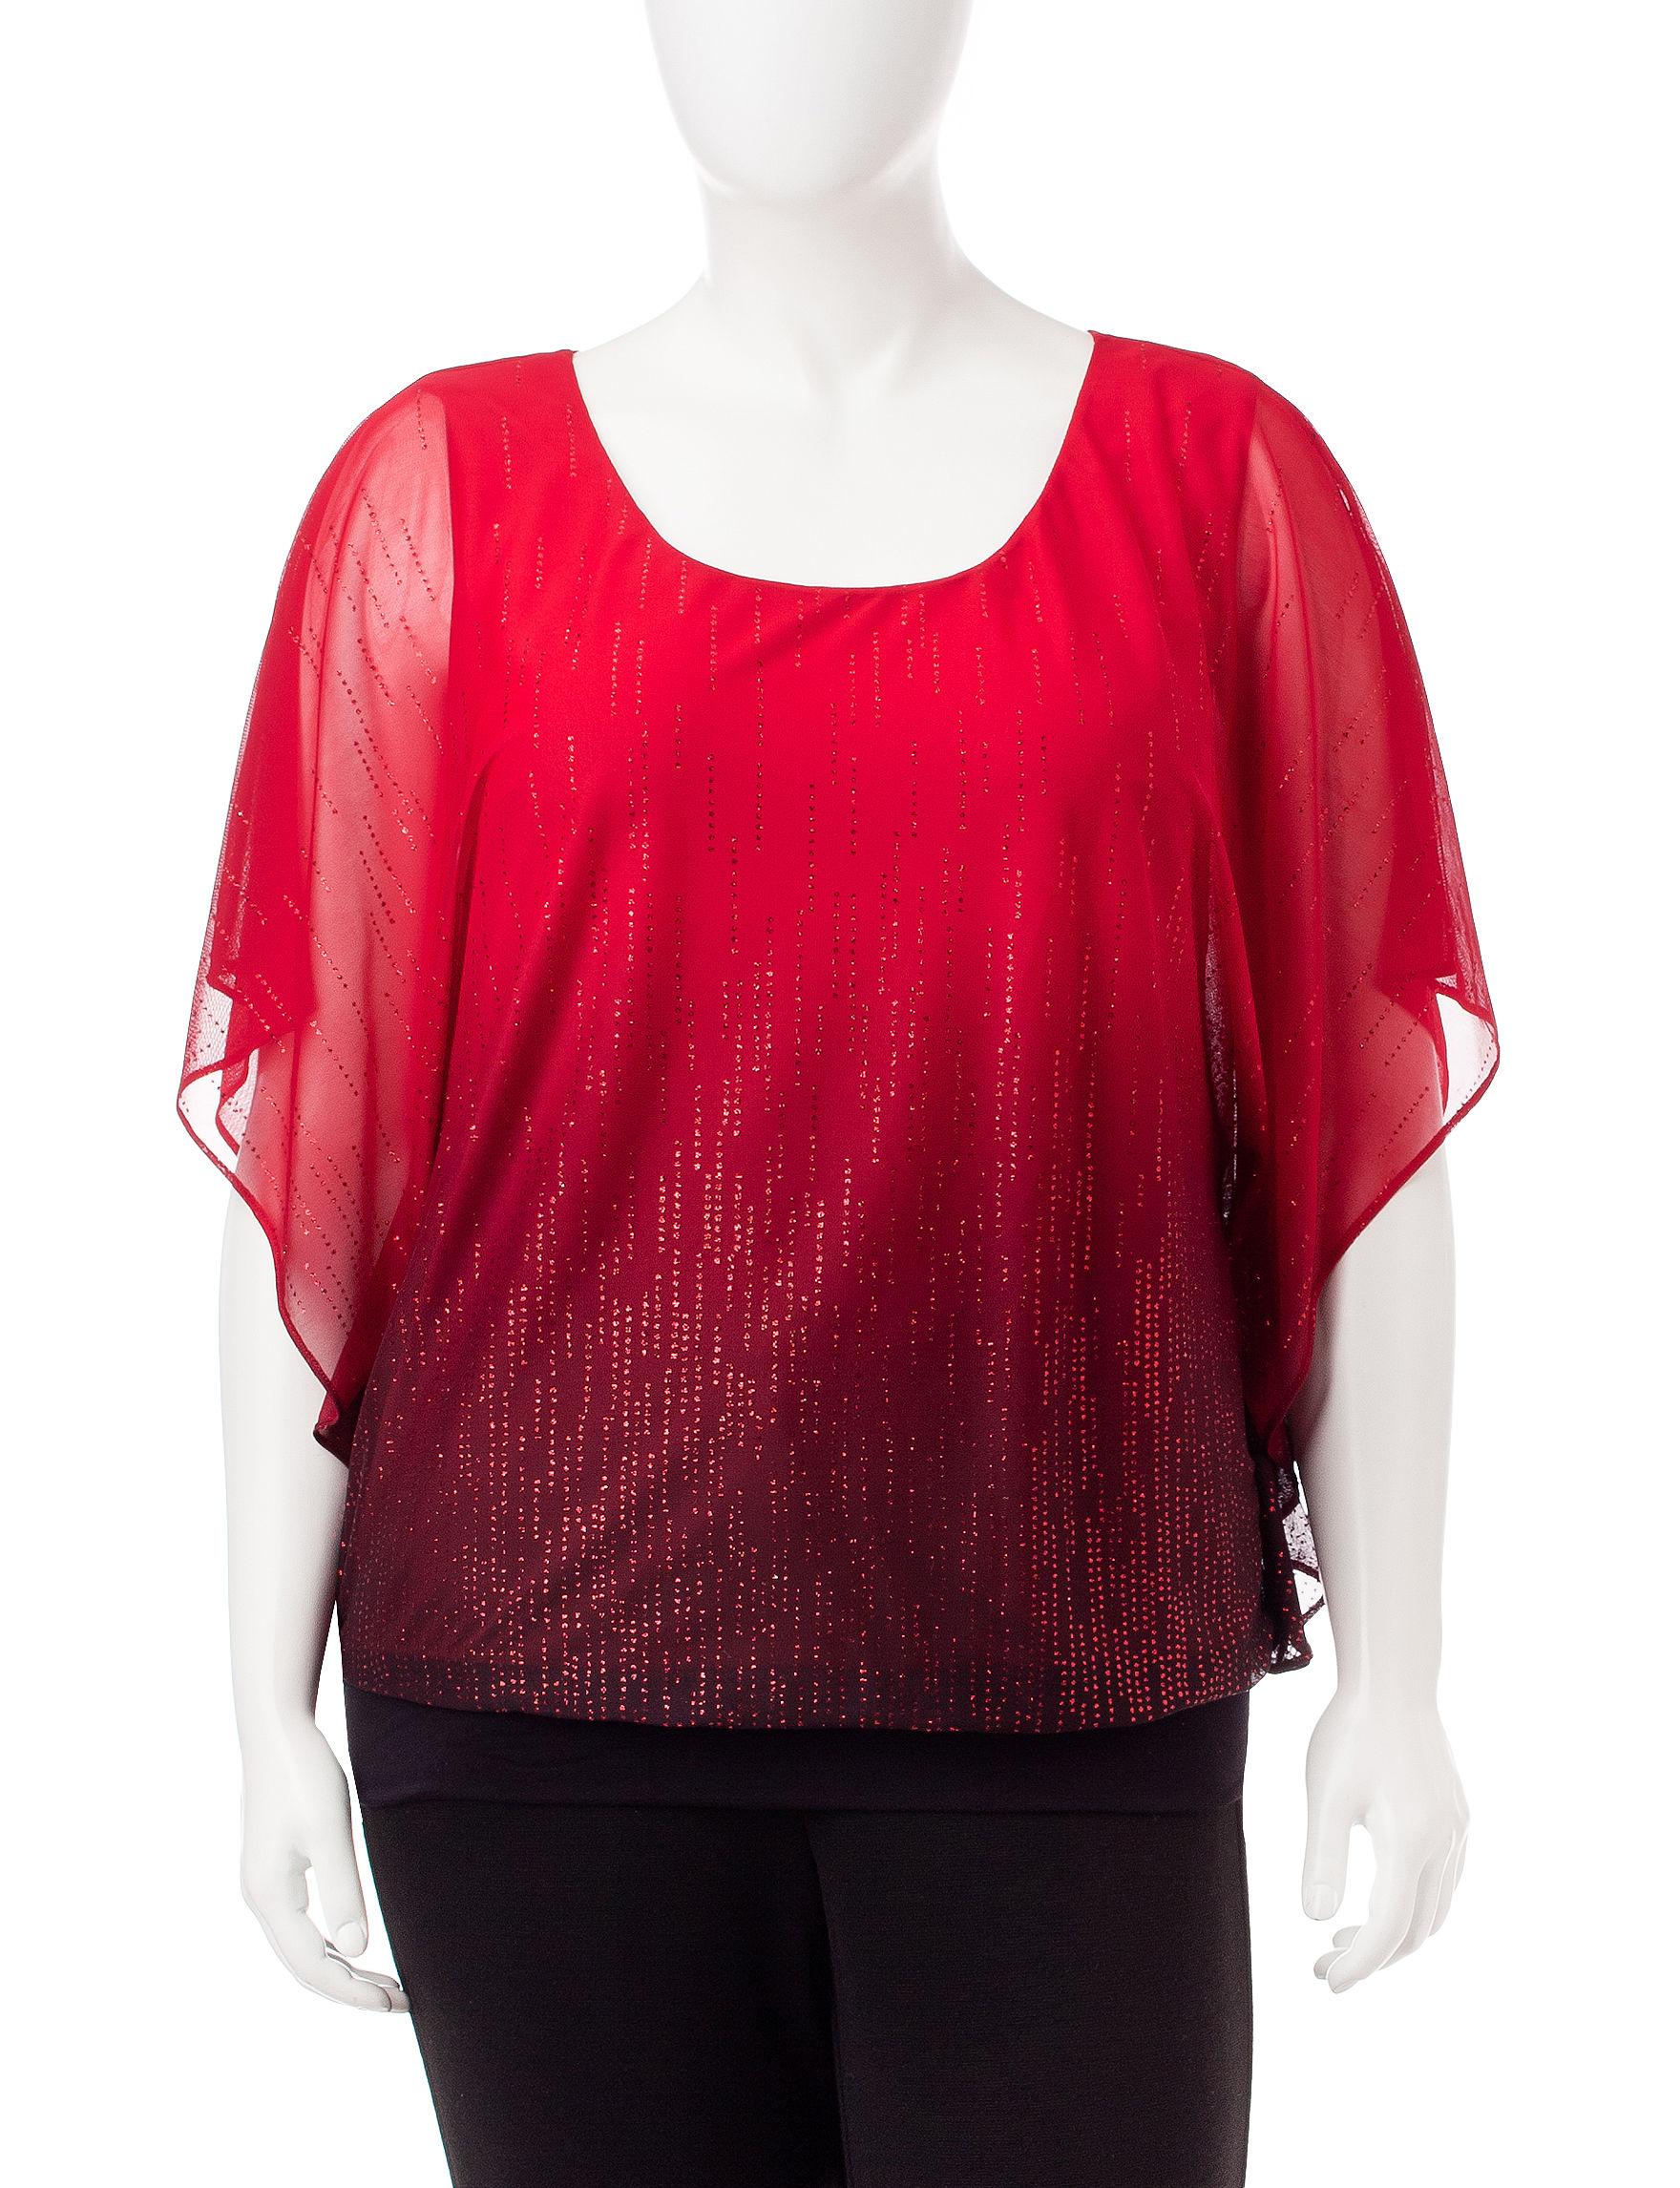 Rebecca Malone Red / Black Shirts & Blouses